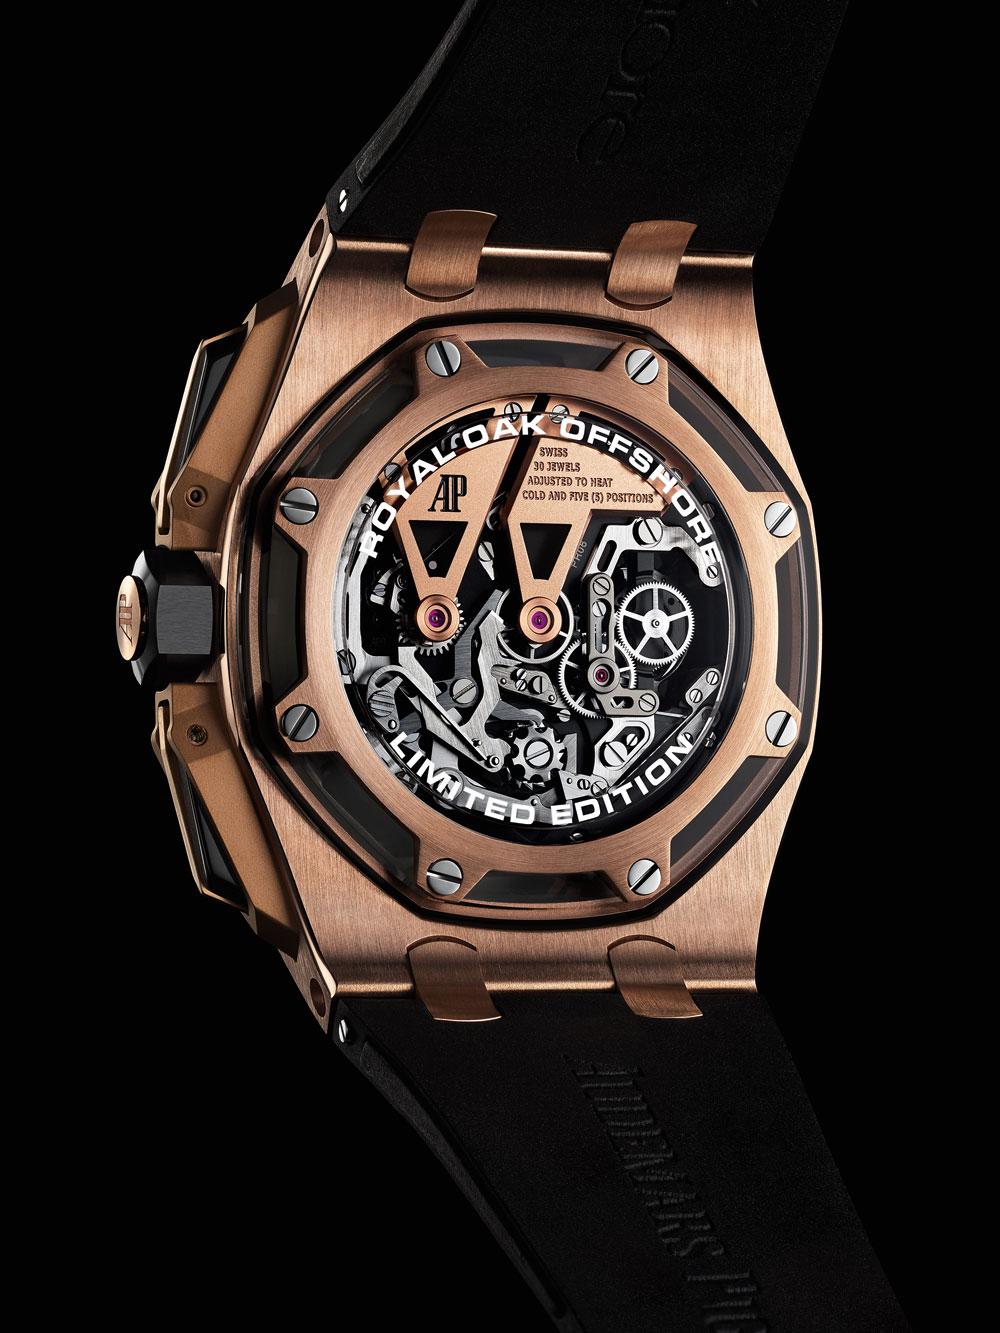 42a9b625375 Mecanismo carga manual Reloj Audemars Piguet Royal Oak Offshore Tourbillon  Chronograph oro rosa